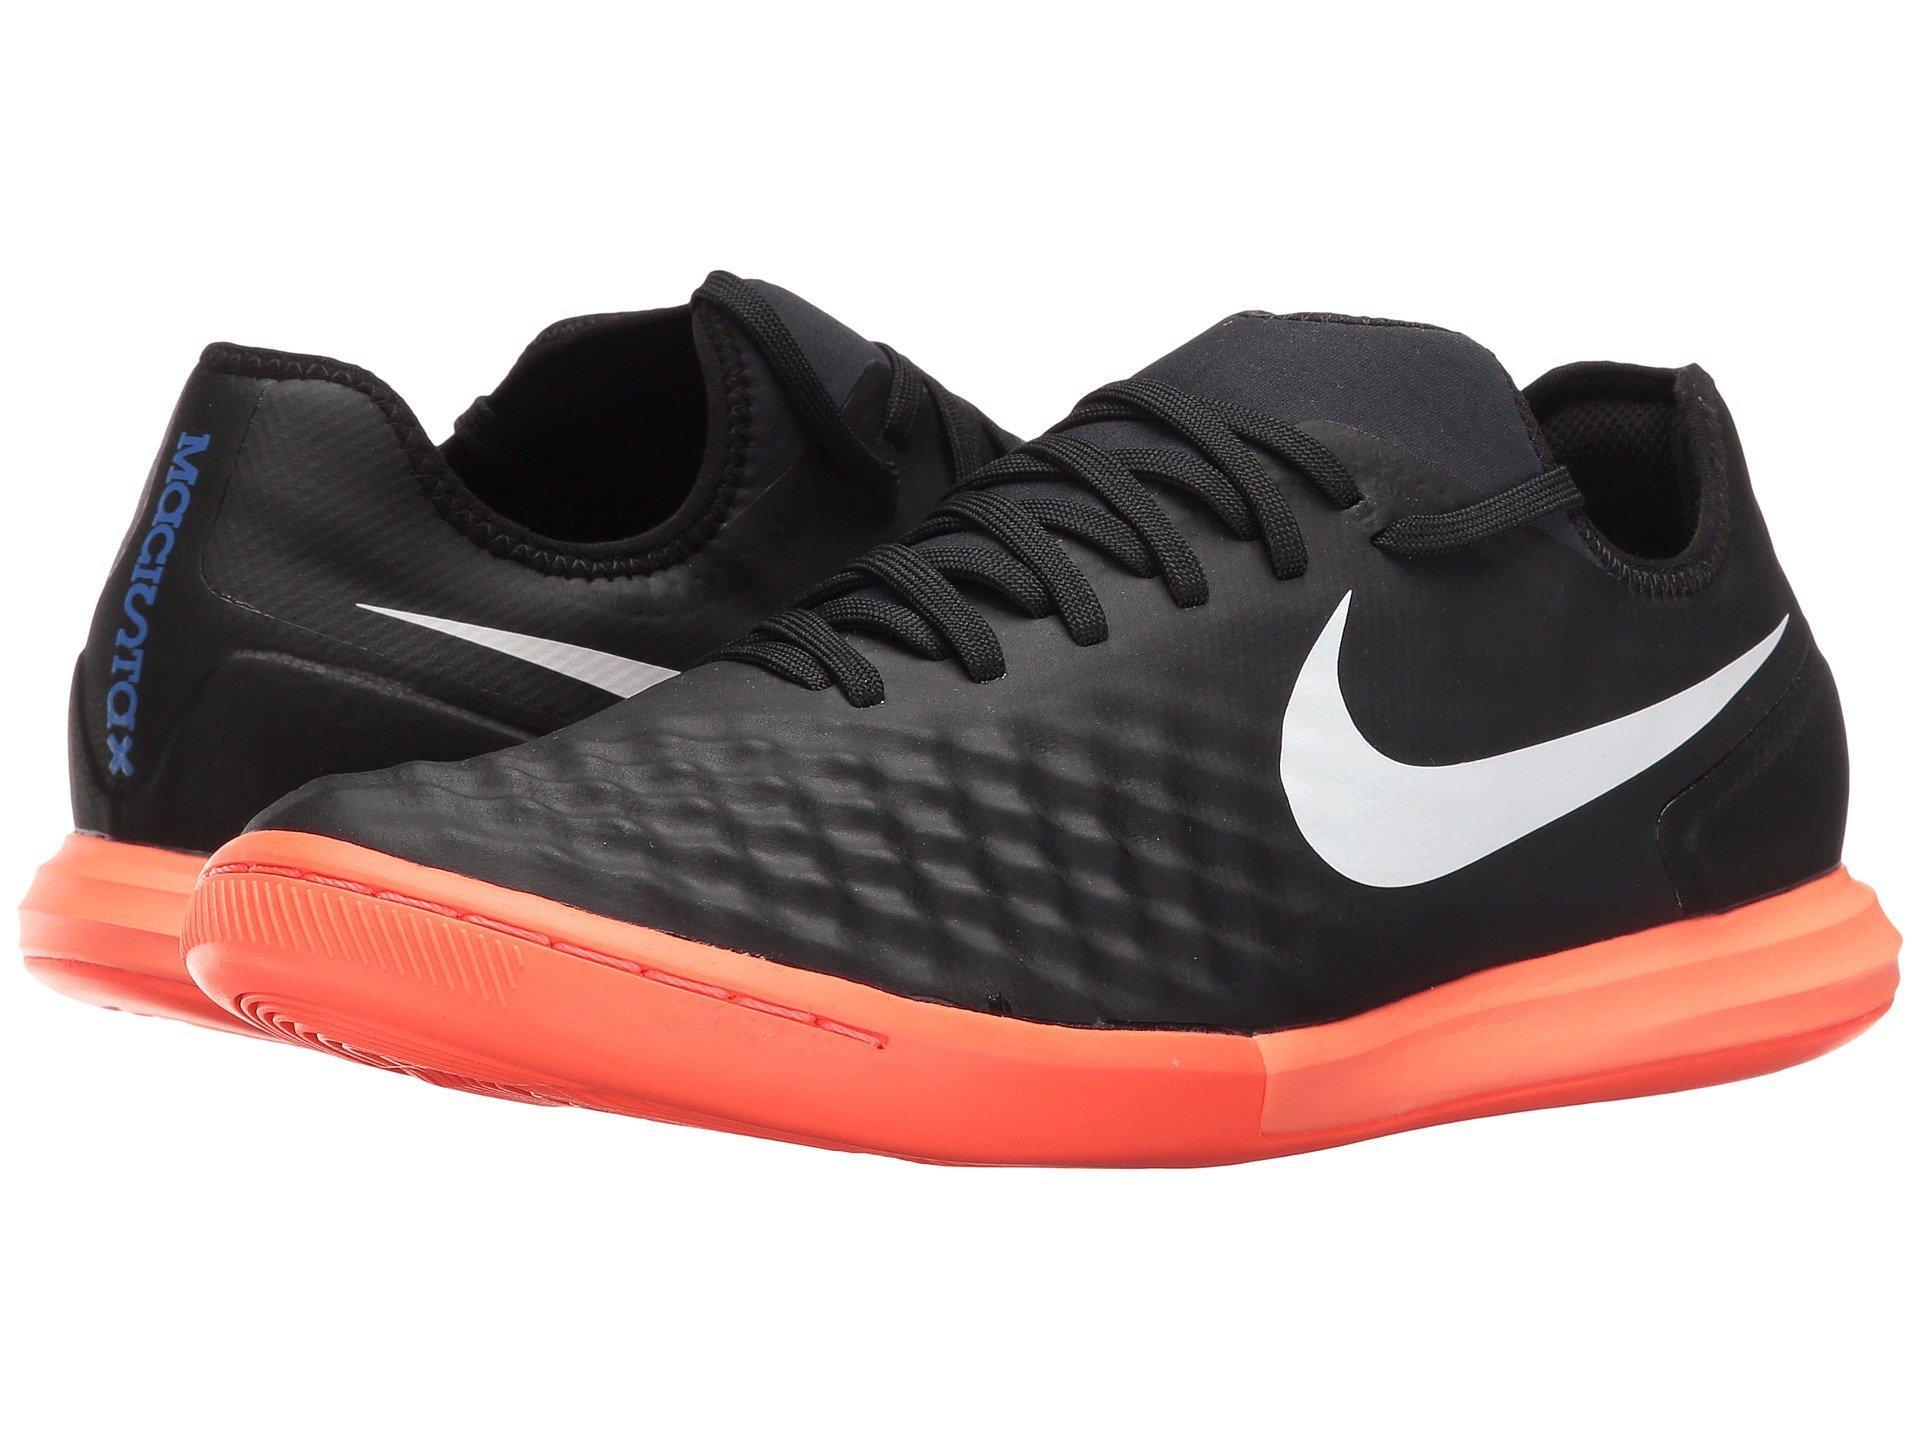 Vigilante gemelo ayudante  Nike Magistax Finale Ii Ic In Black/white/hyper Orange/paramount Blue |  ModeSens